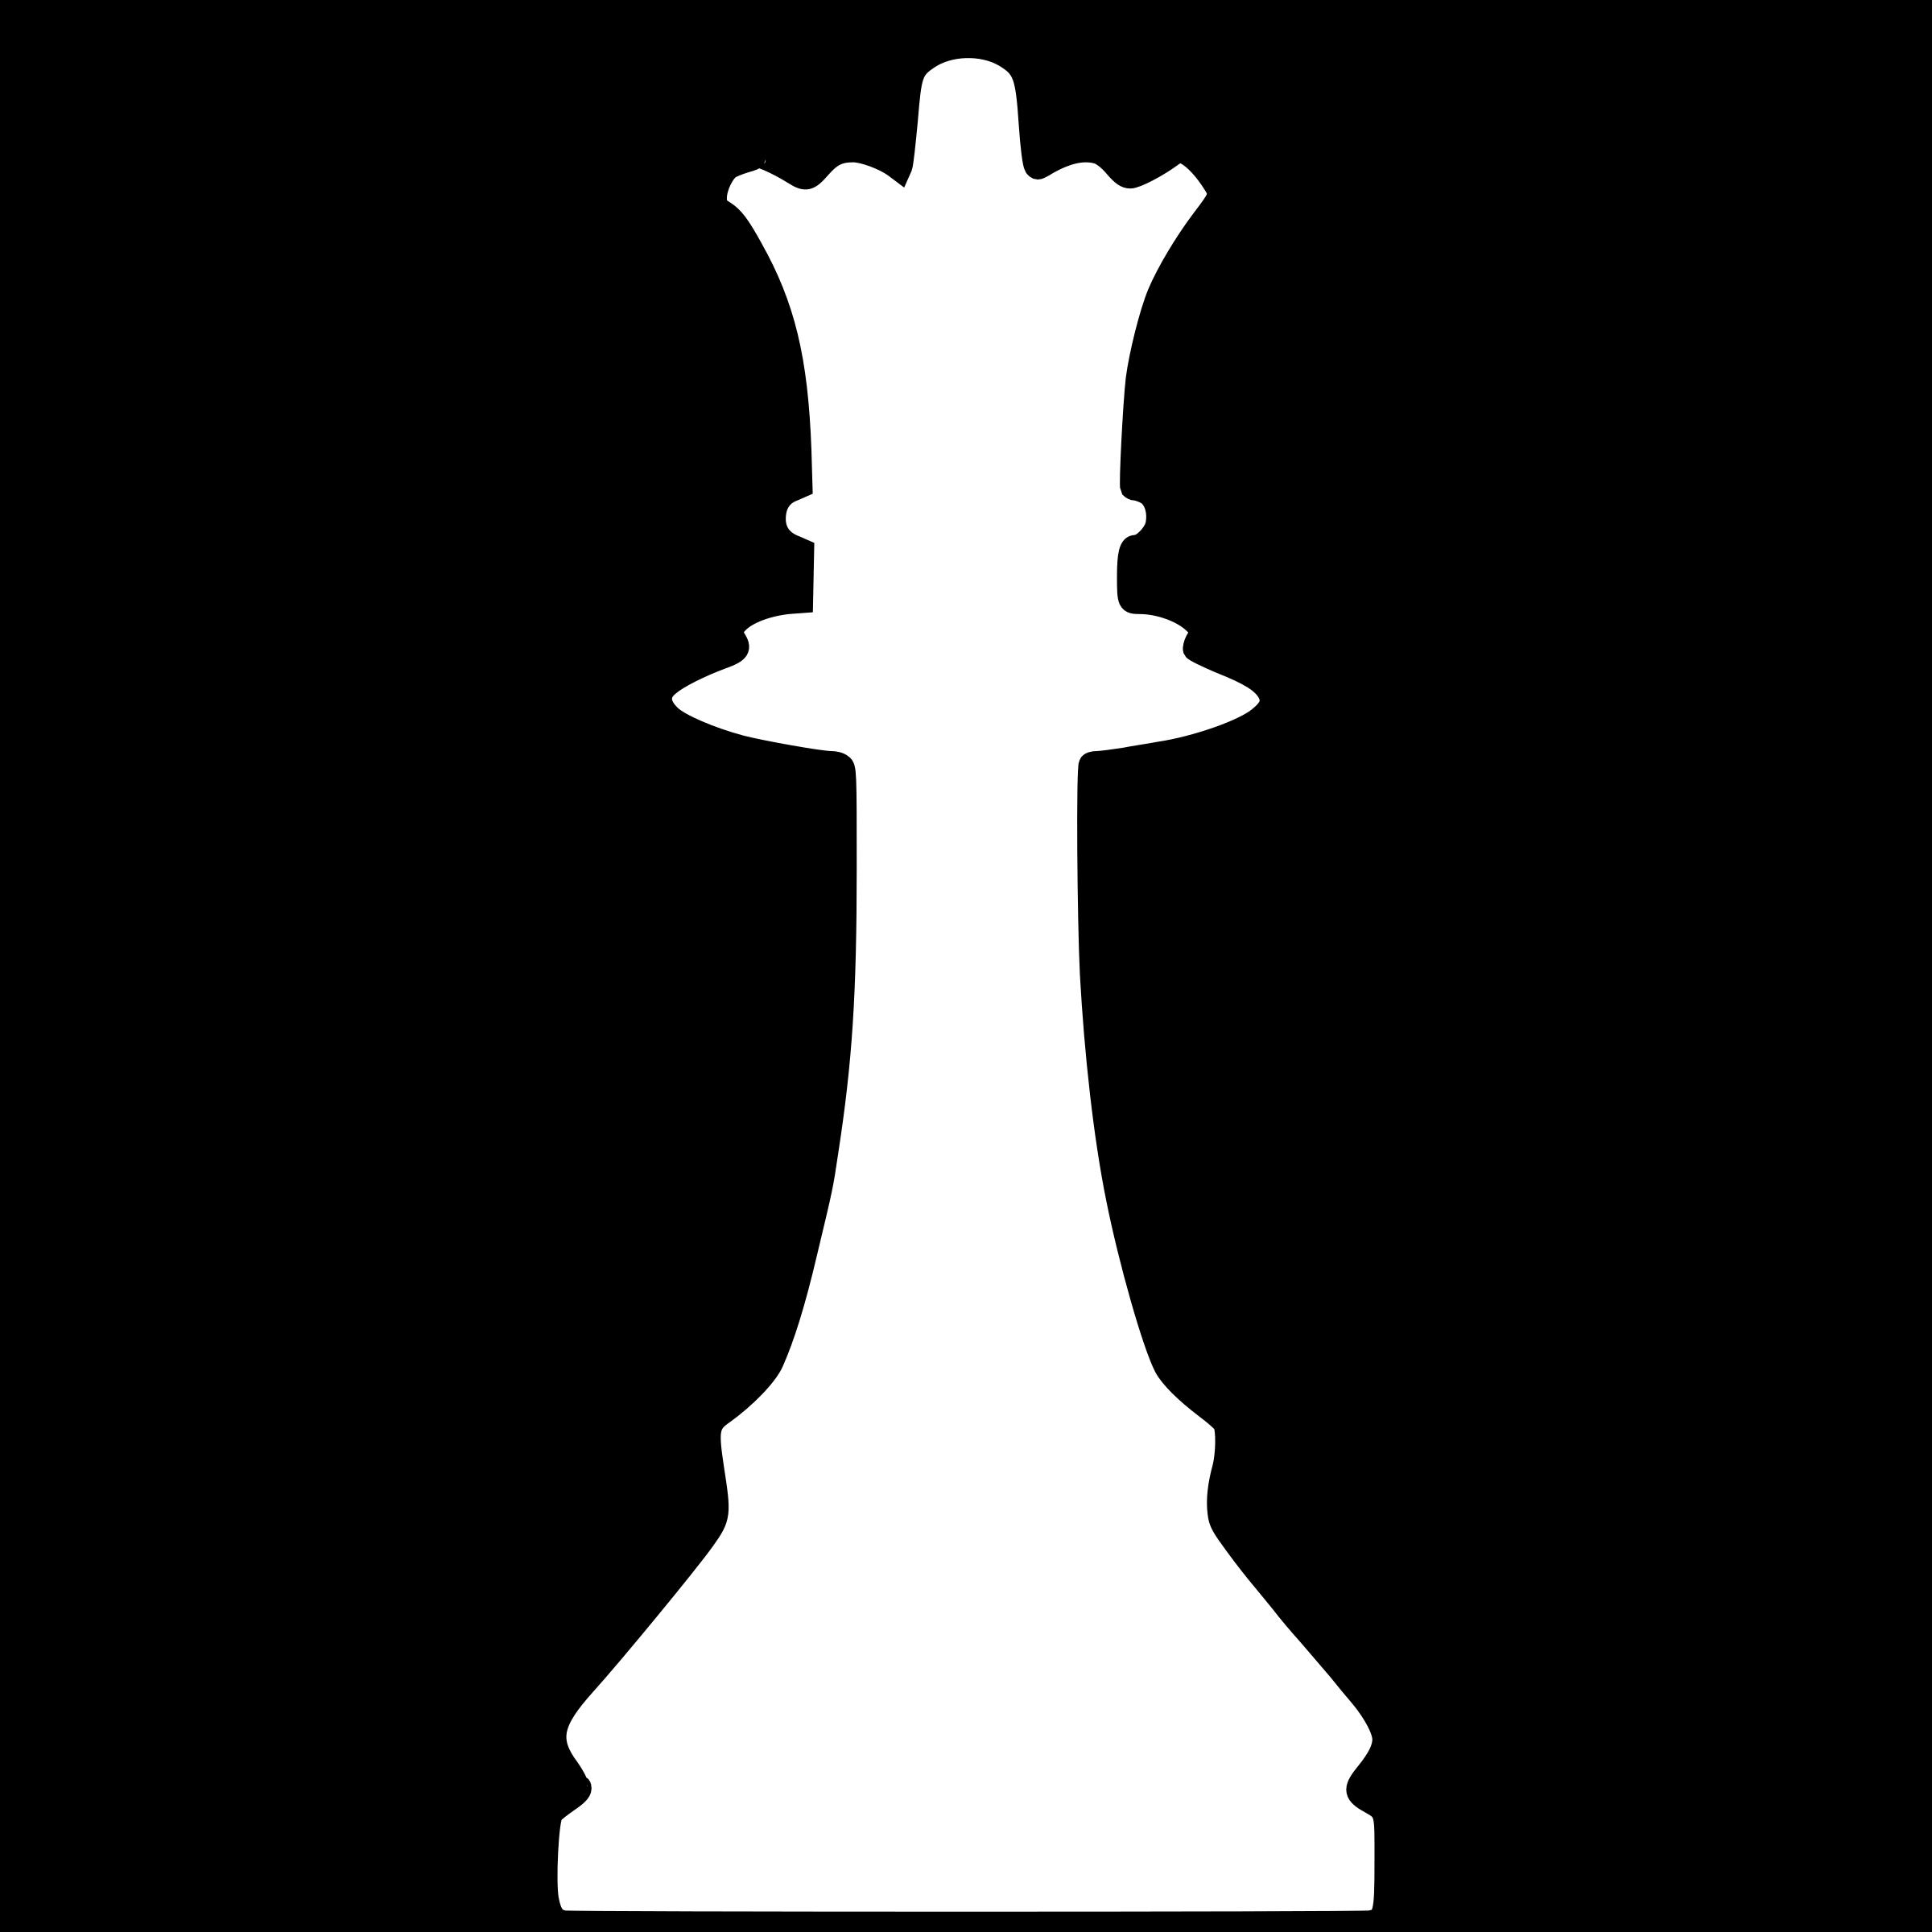 White silhouette remix dama. Queen clipart chess piece